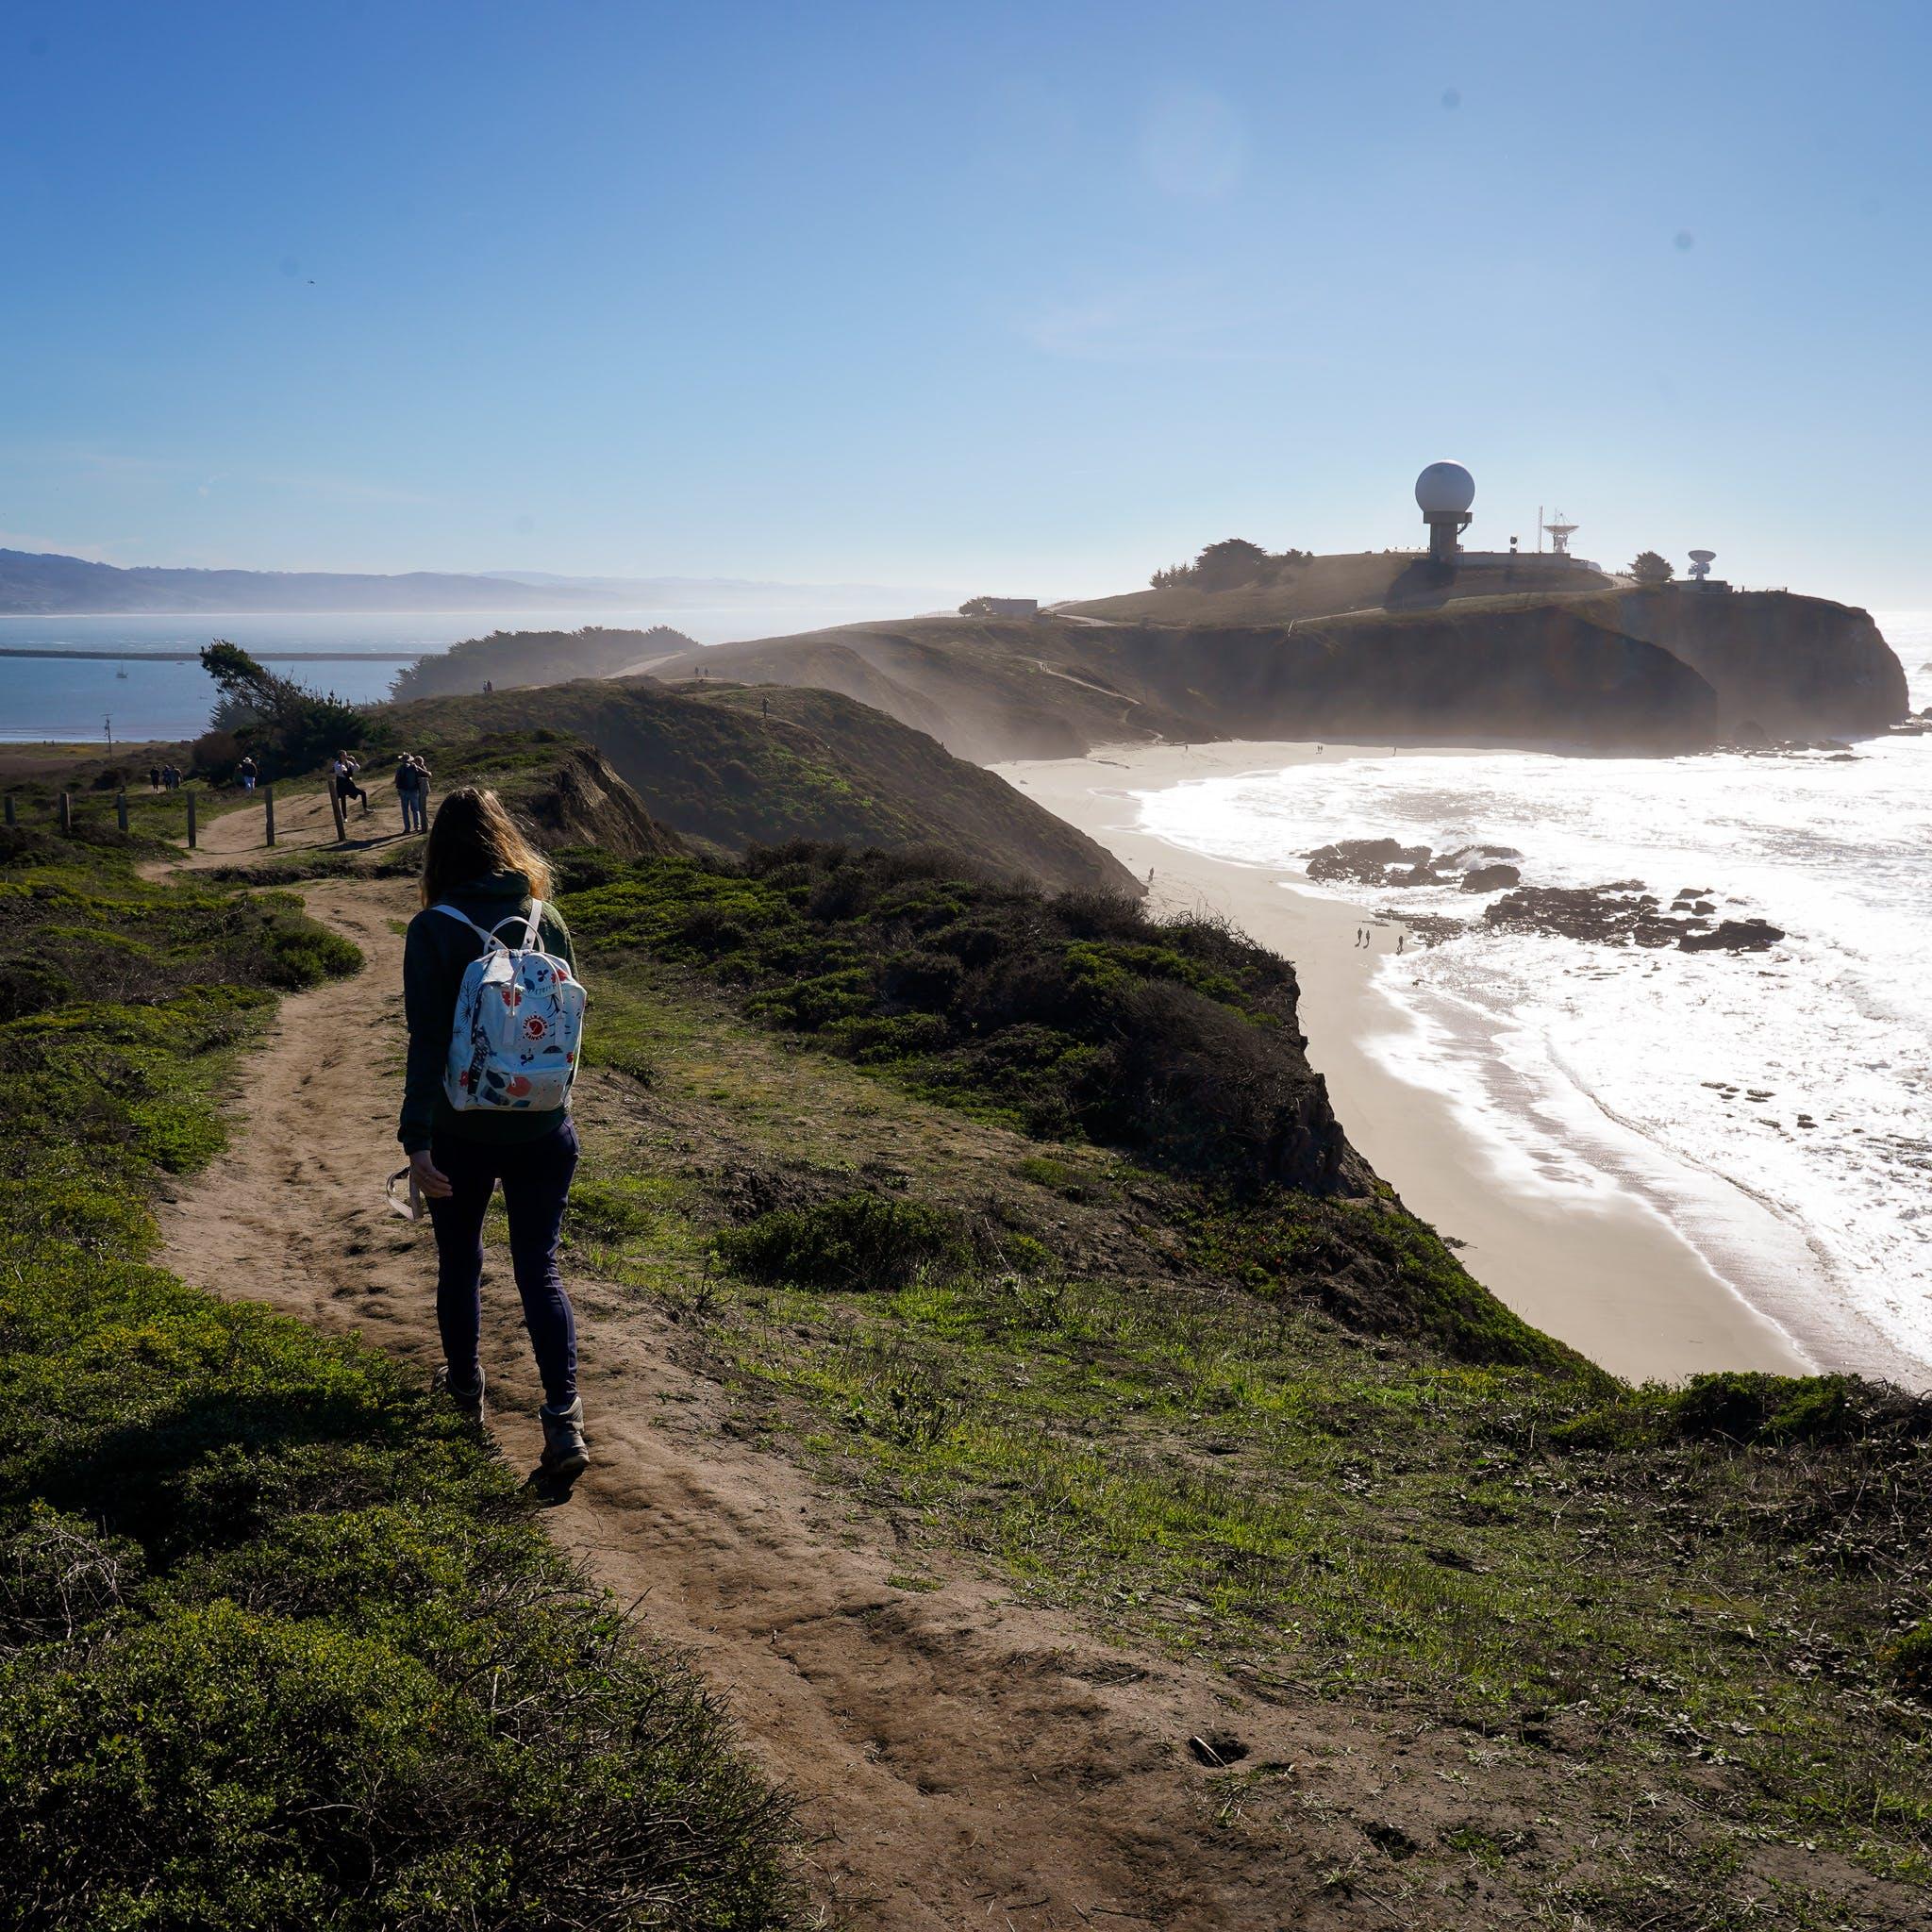 Woman hiking along Pillar Point Bluff towards the Pillar Point Air Force Station